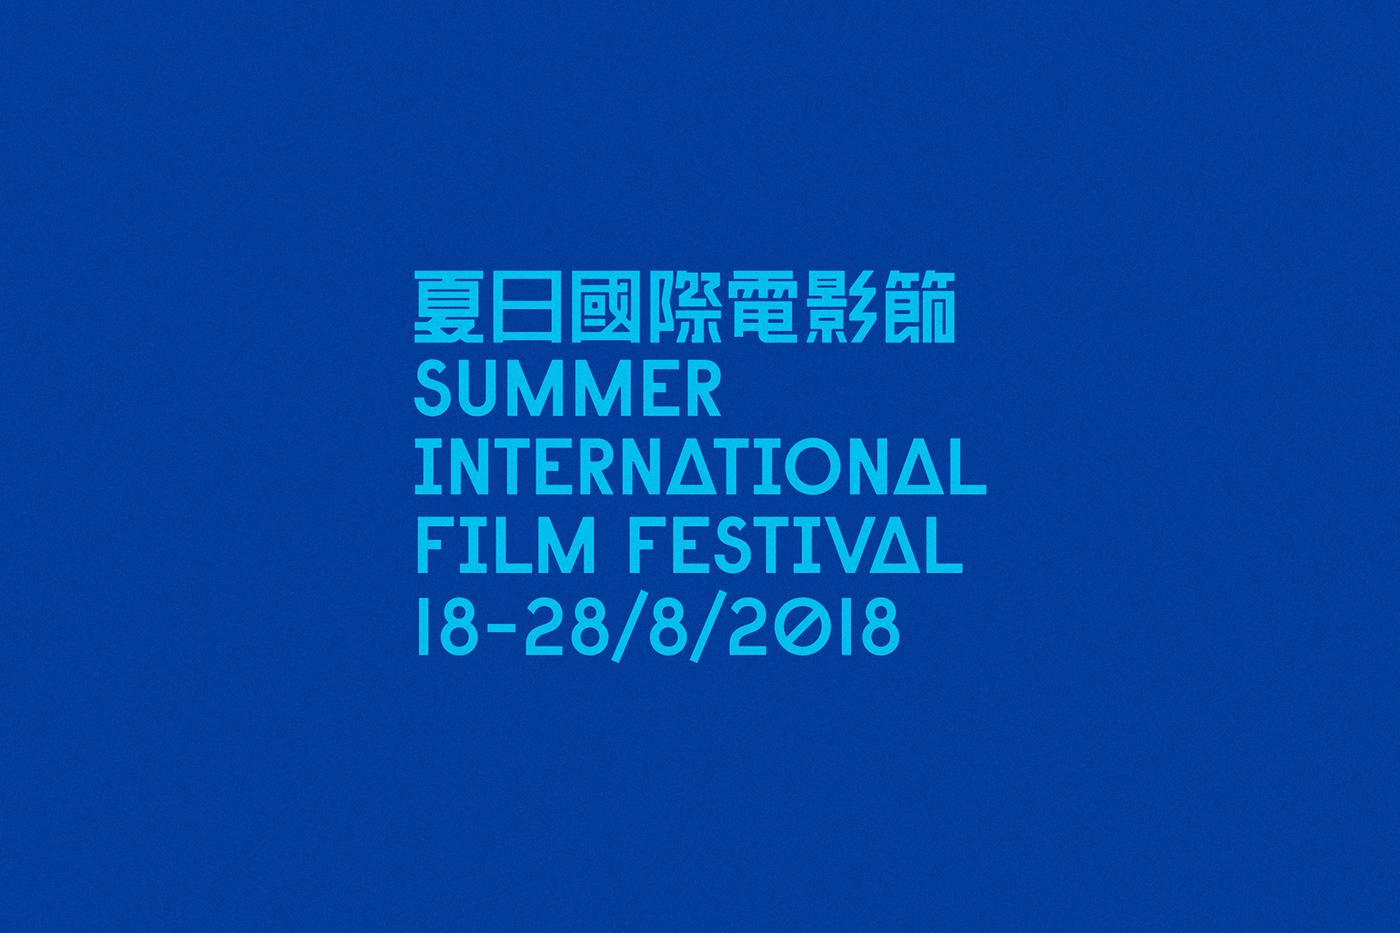 Film  ,movie,ILLUSTRATION ,Isometric,Hong Kong,japan,animation ,train,summer,festival